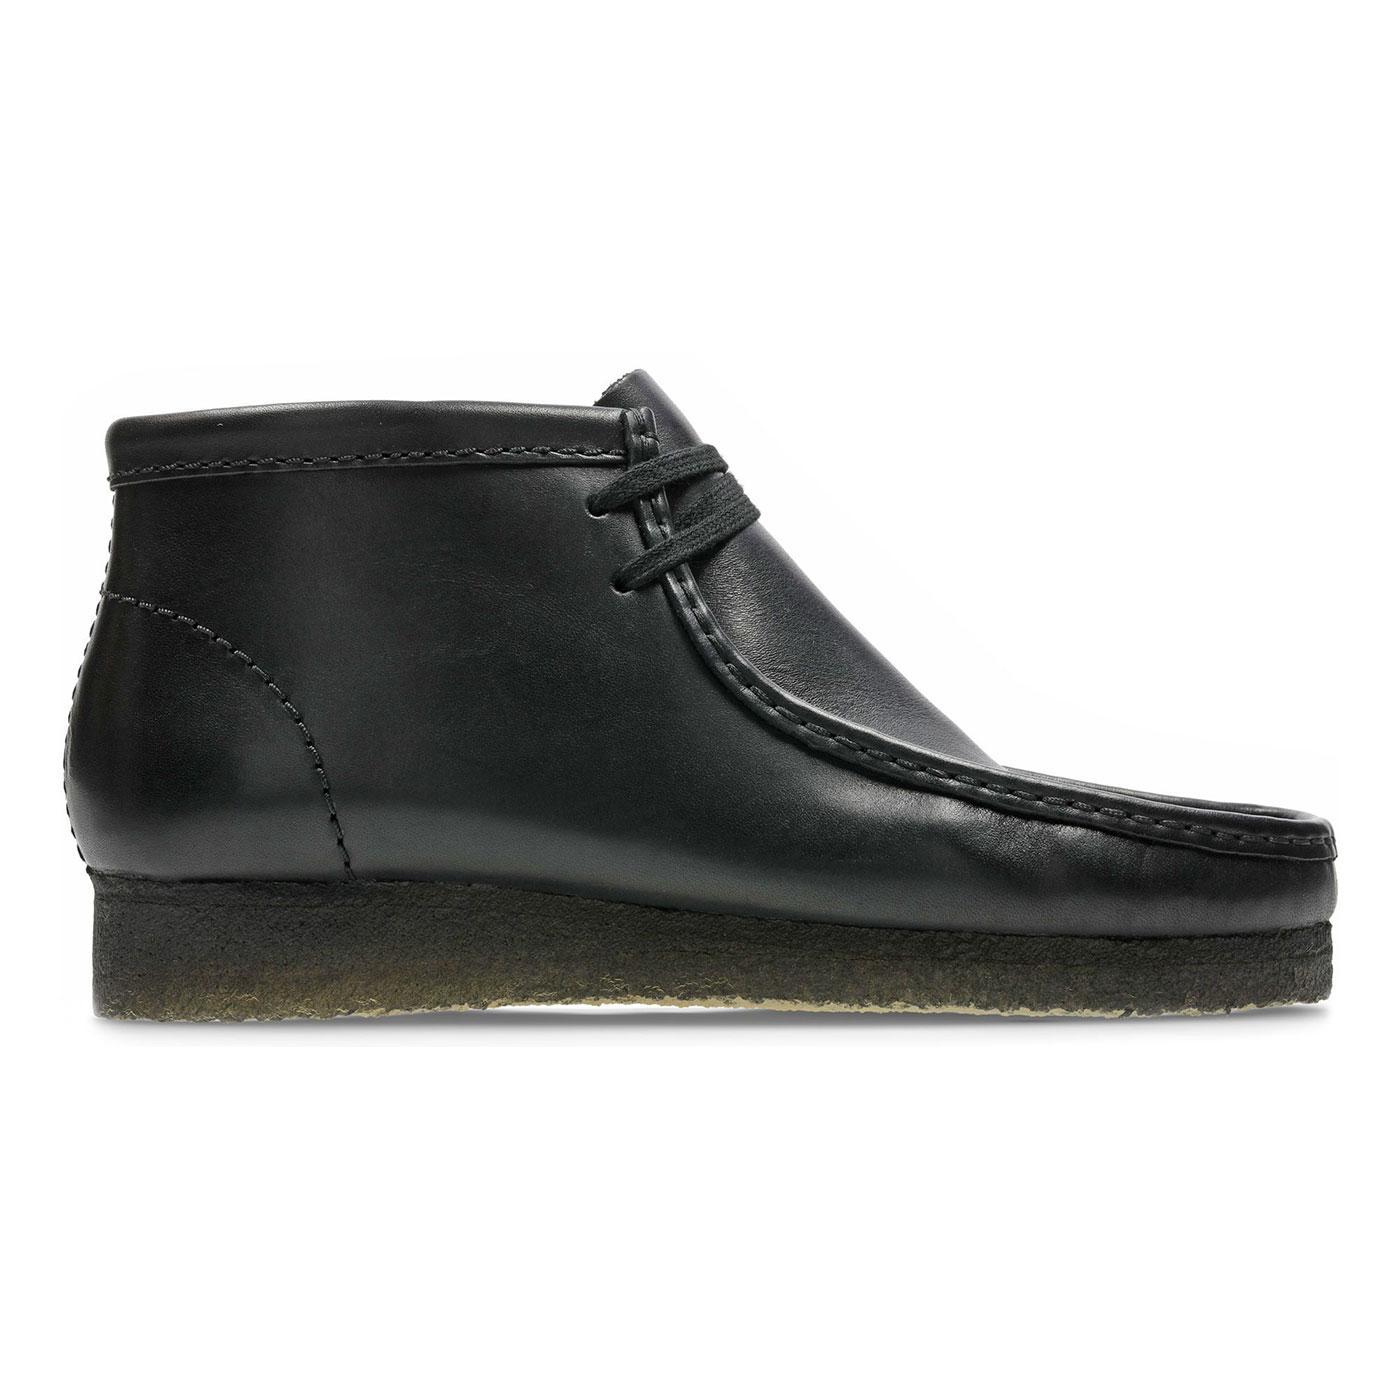 CLARKS ORIGINALS Wallabee Boots Retro